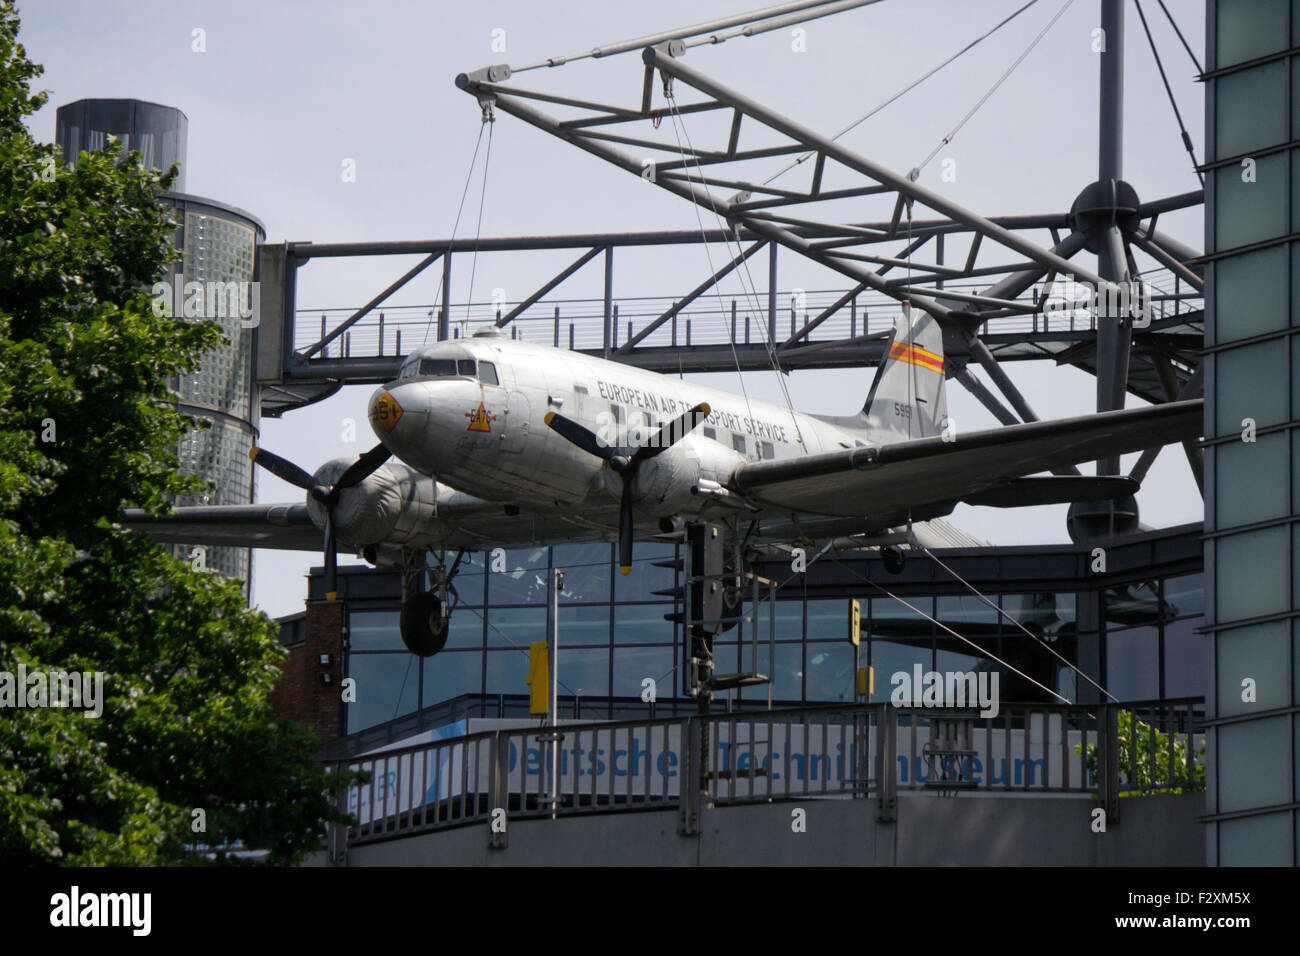 'Rosinenbomber' auf dem Dach des Deutschen Technikmuseums, Berlin-Kreuzberg. - Stock Image